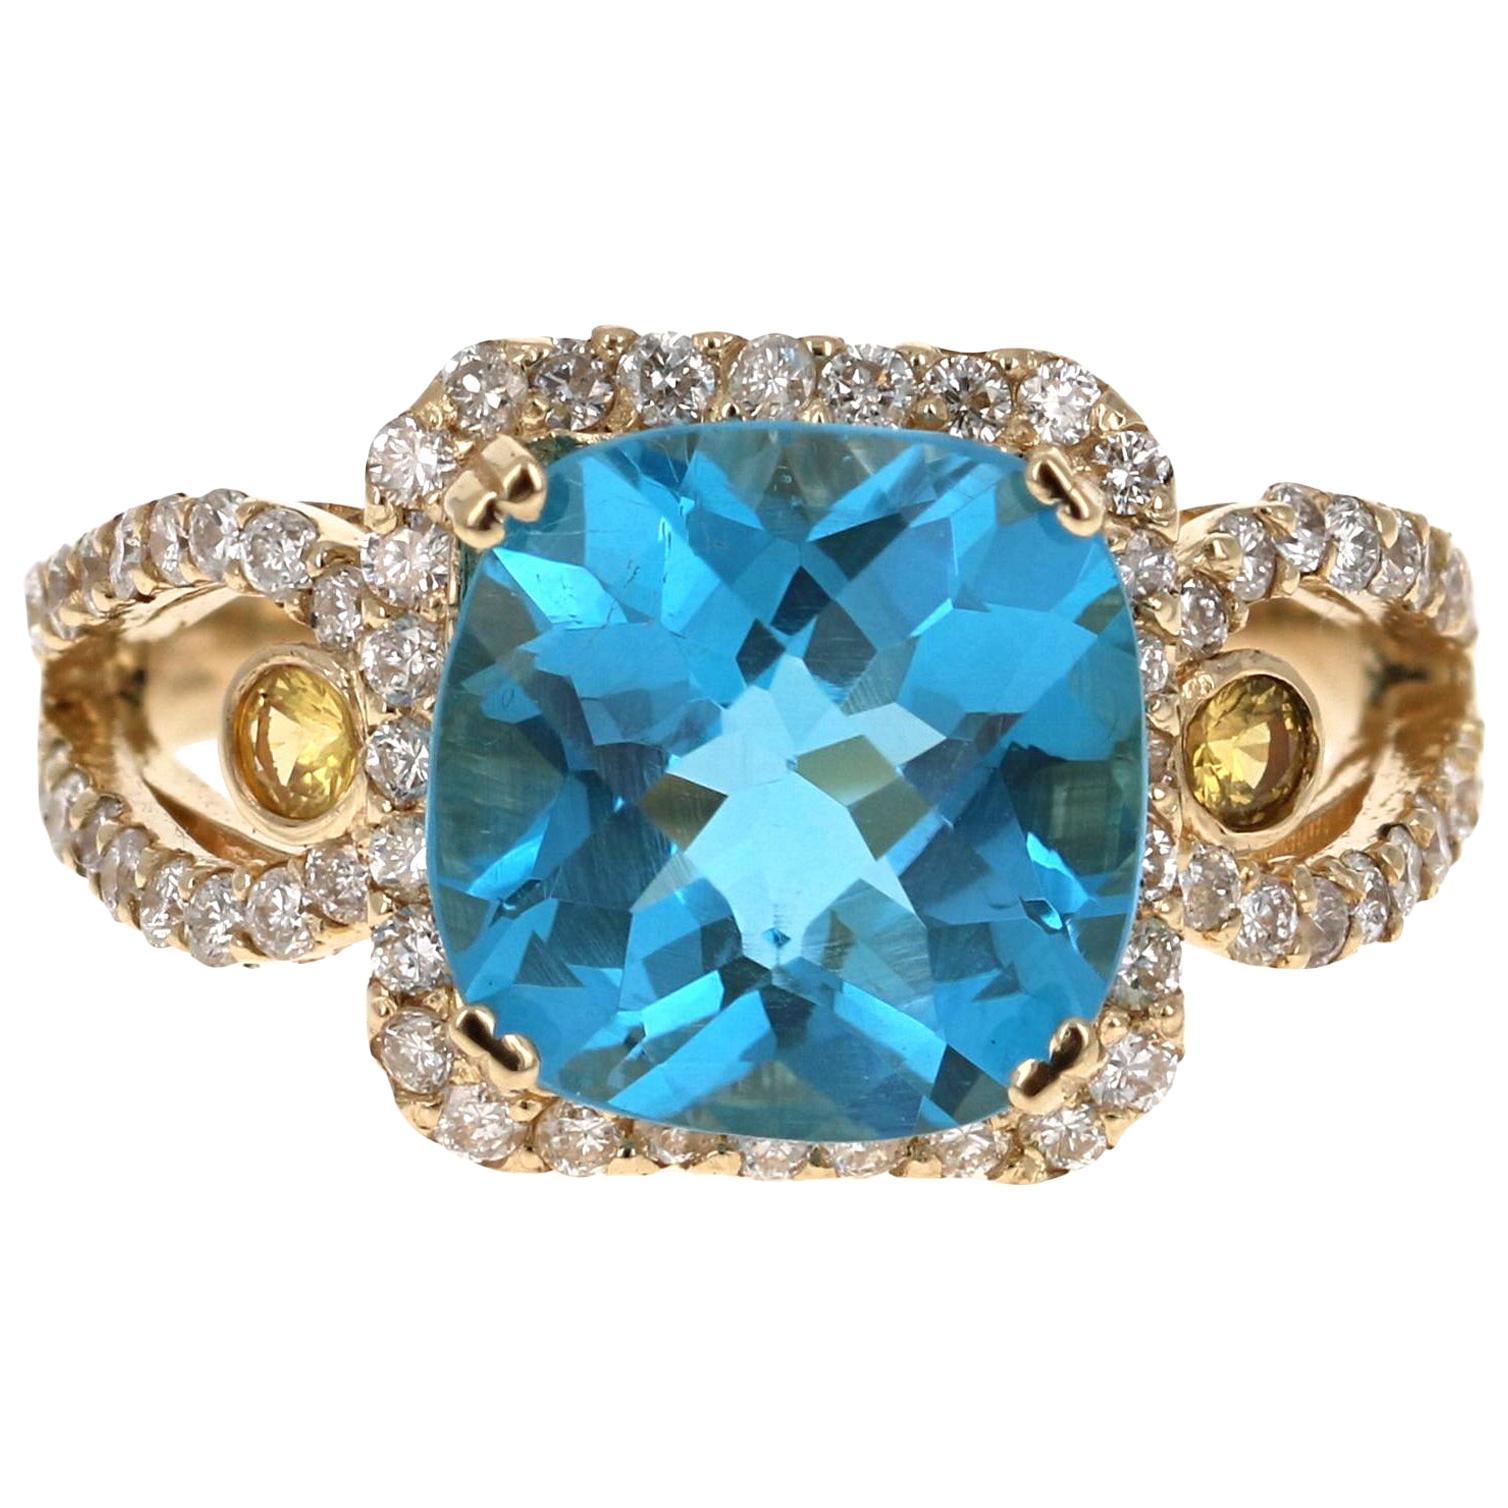 4.72 Carat Blue Topaz Sapphire Diamond Yellow Gold Cocktail Ring